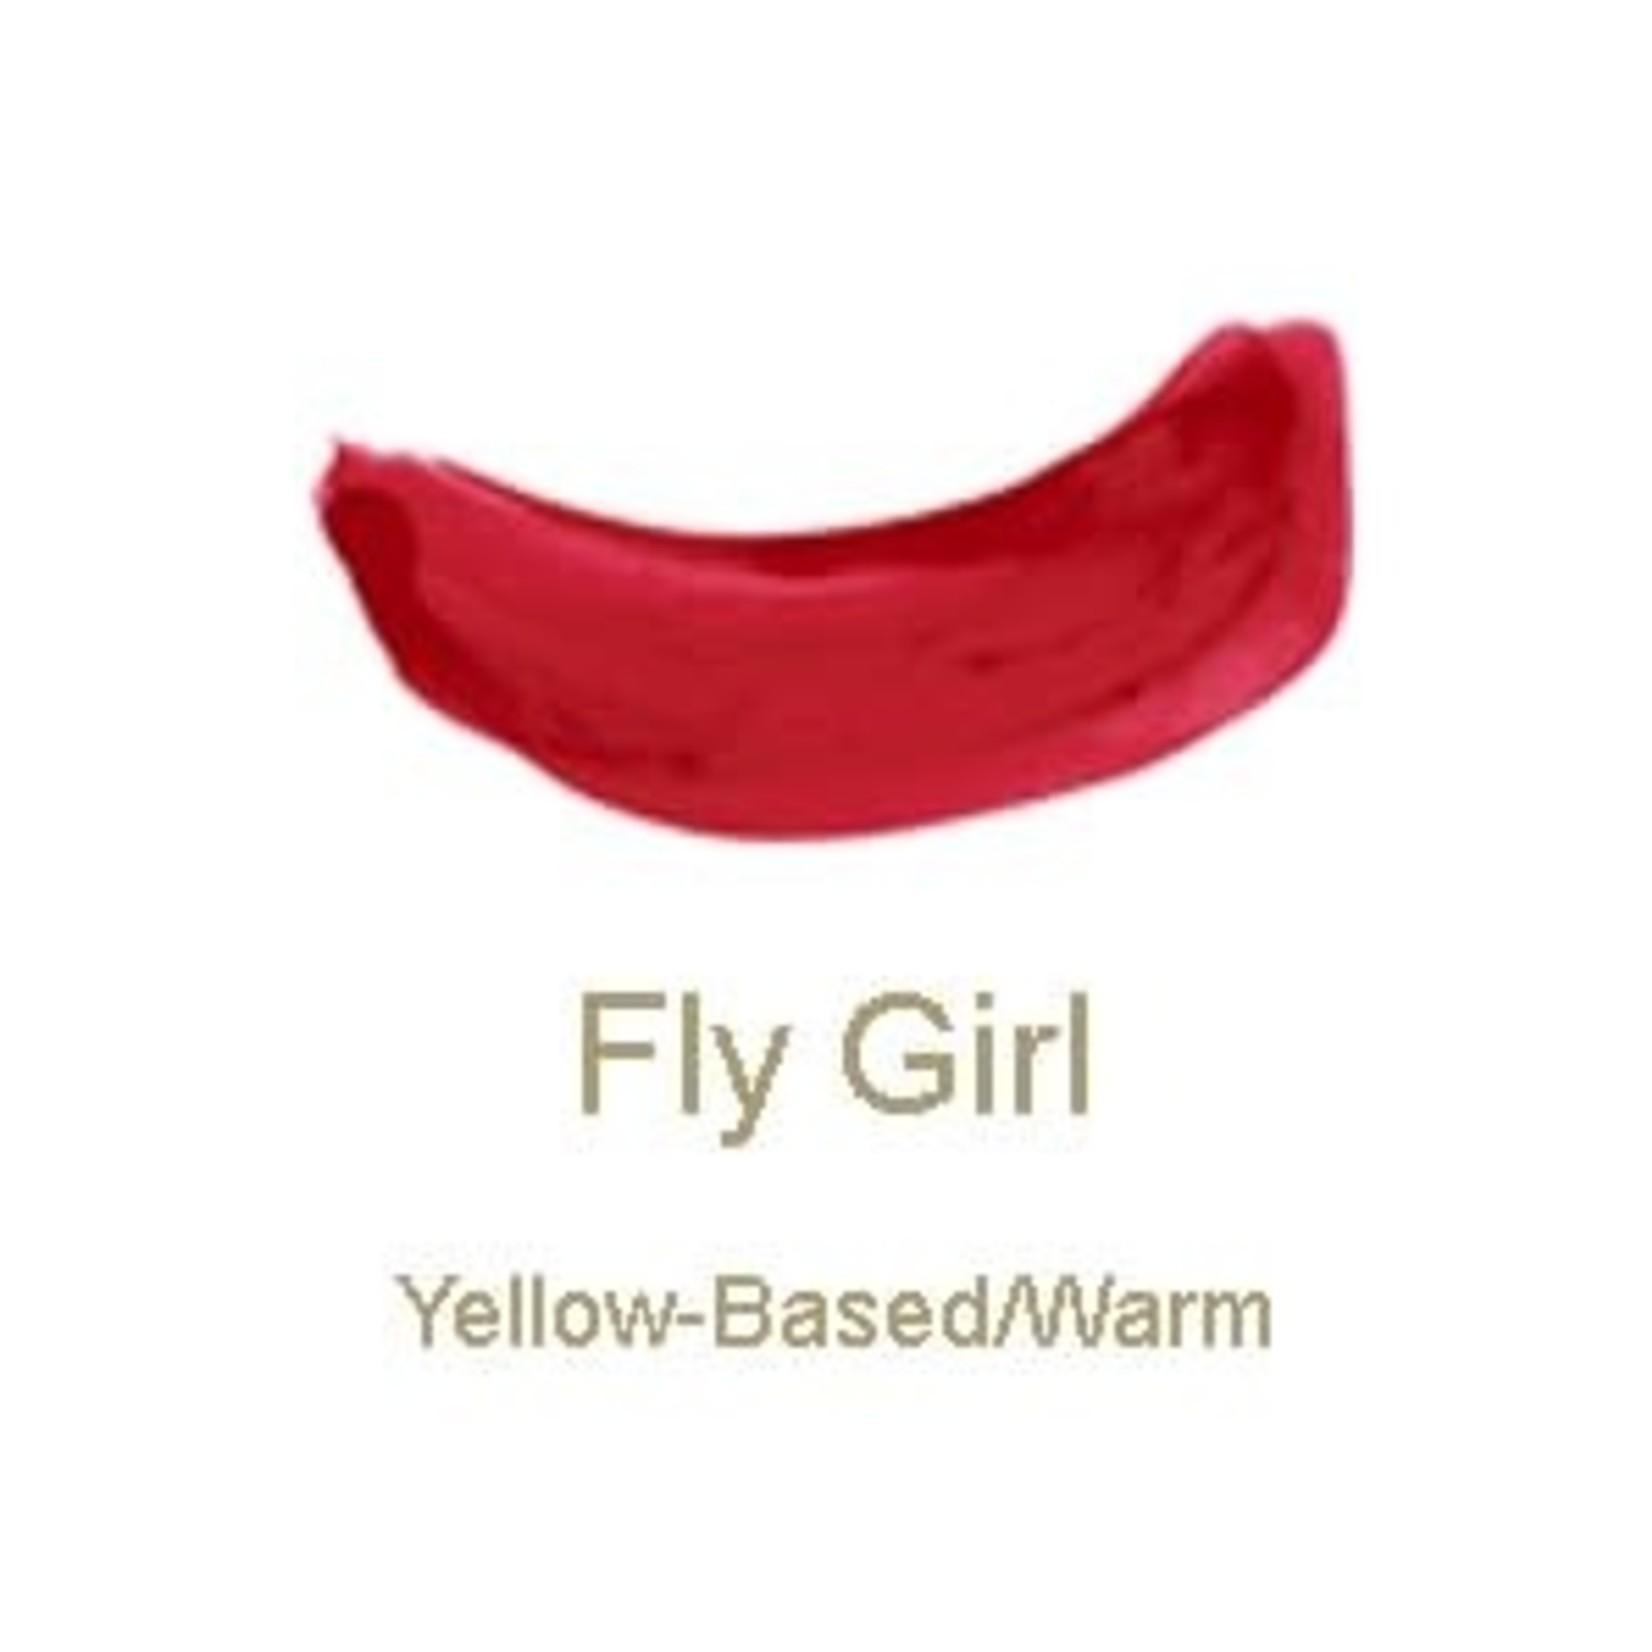 SeneGence LipSense Fly Girl